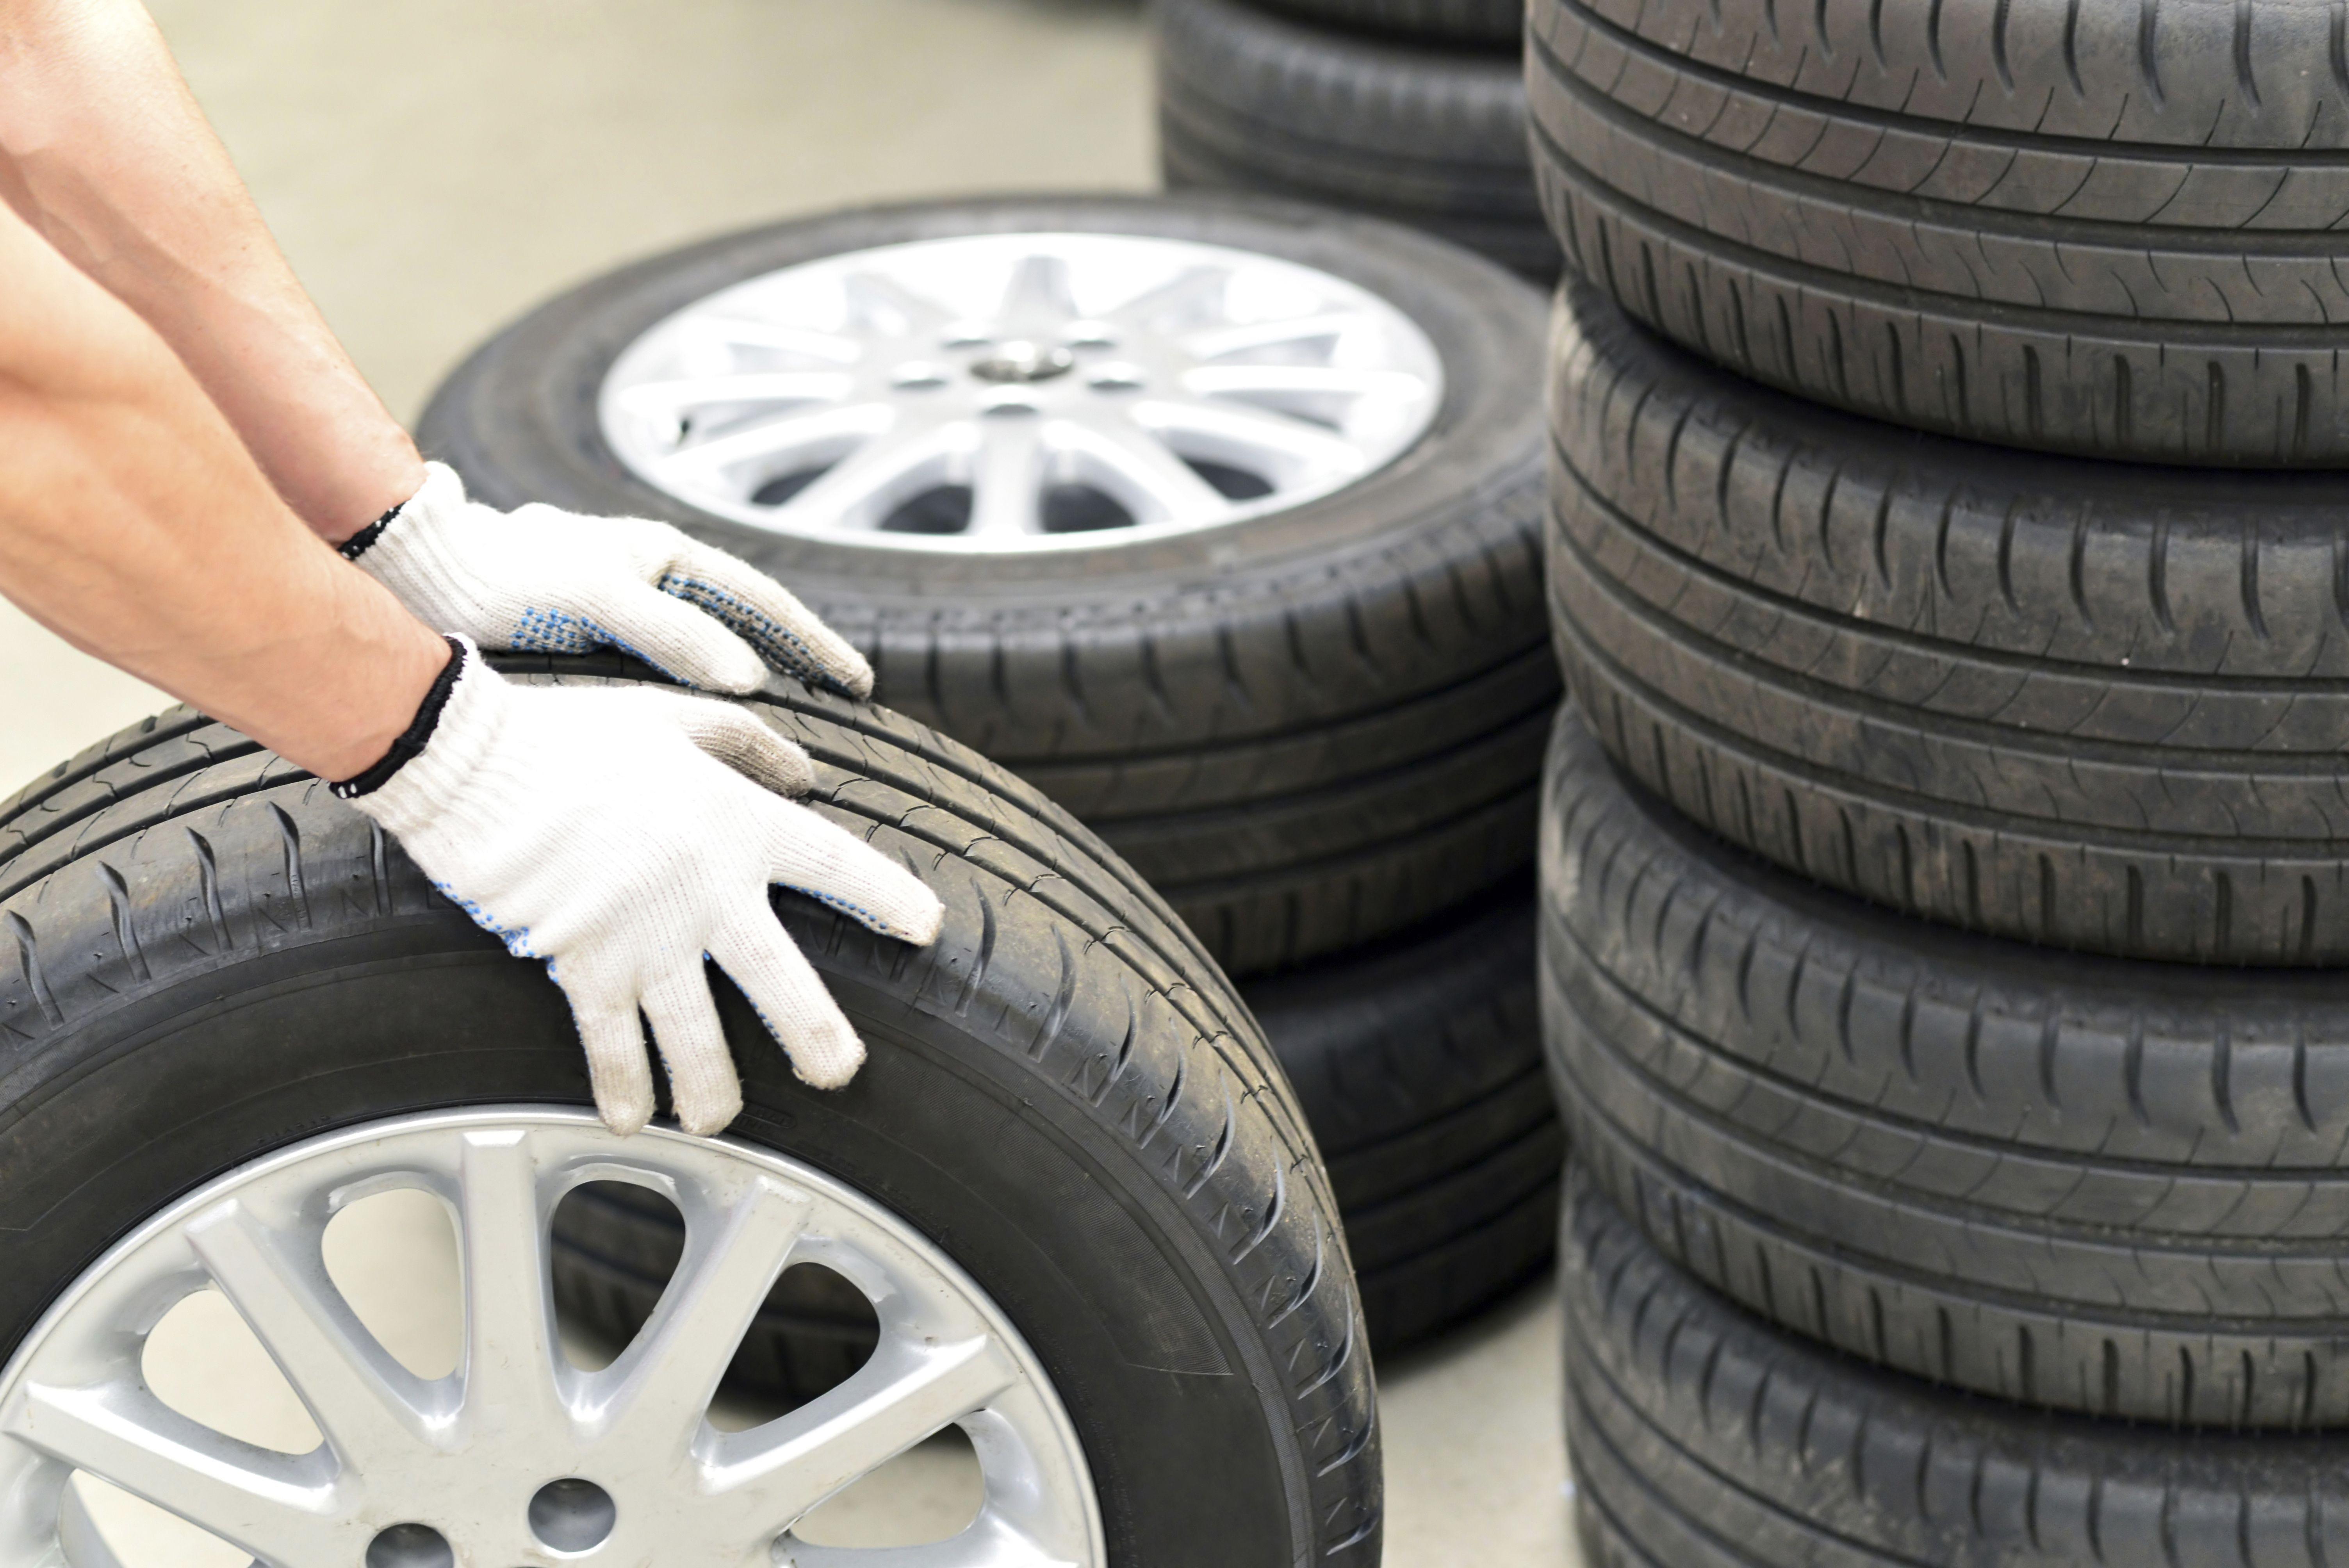 Car Tire Parts Diagram Car Tire and Wheel Buyer S Guide Of Car Tire Parts Diagram